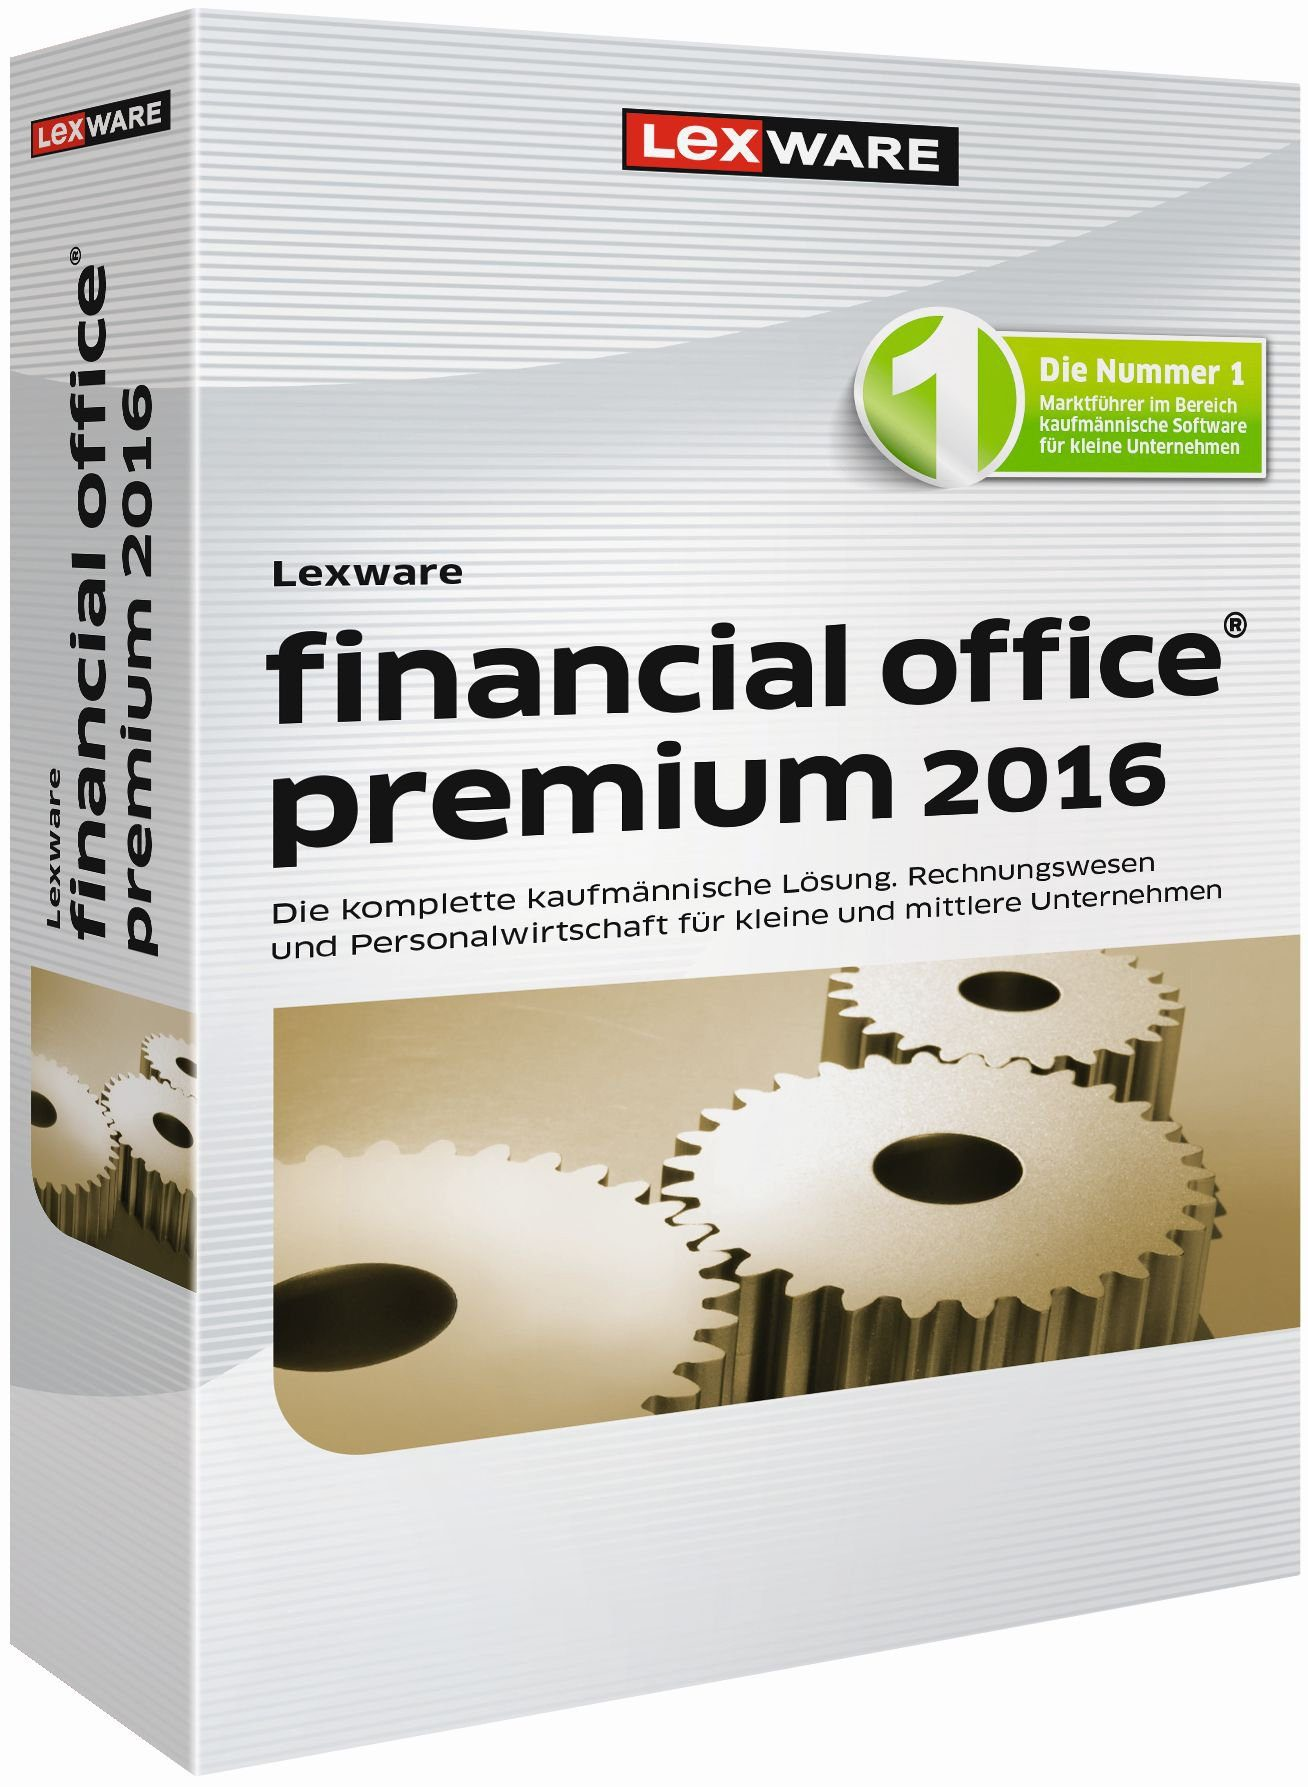 Lexware Kaufmännische Komplettlösung »financial office premium 2016«